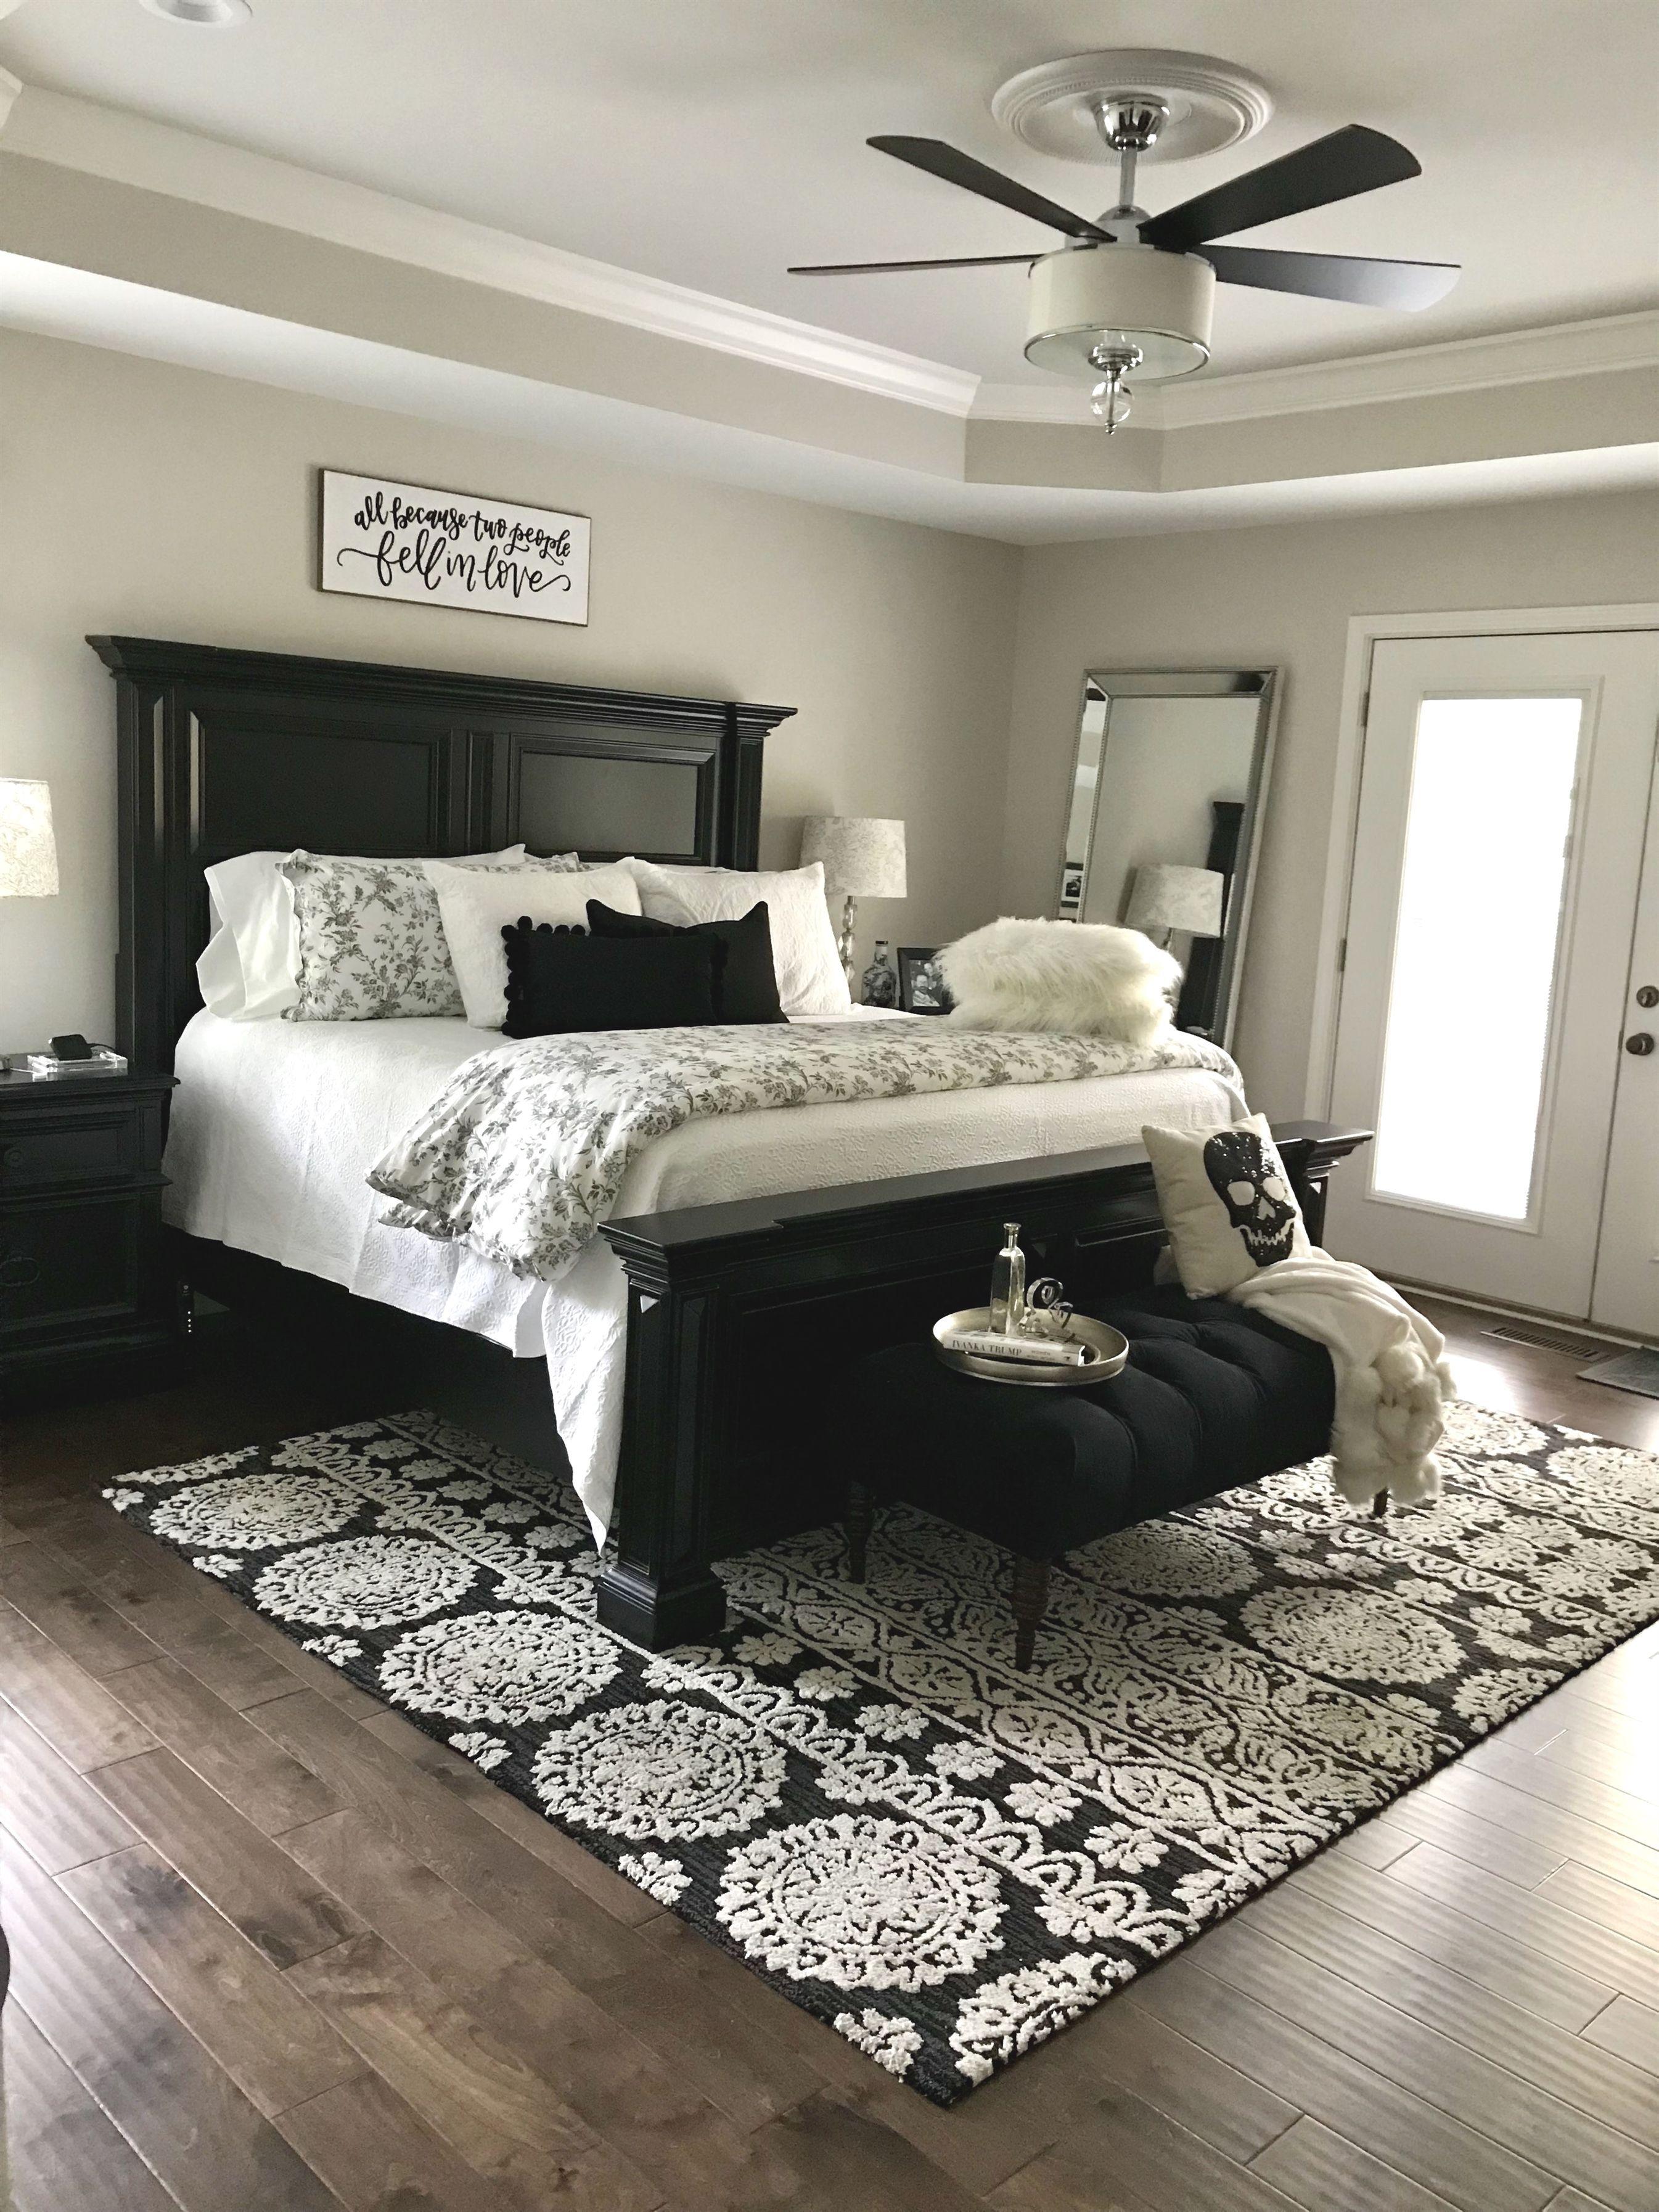 Black And White Master Bedroom Design Bedroomdecoratingideas